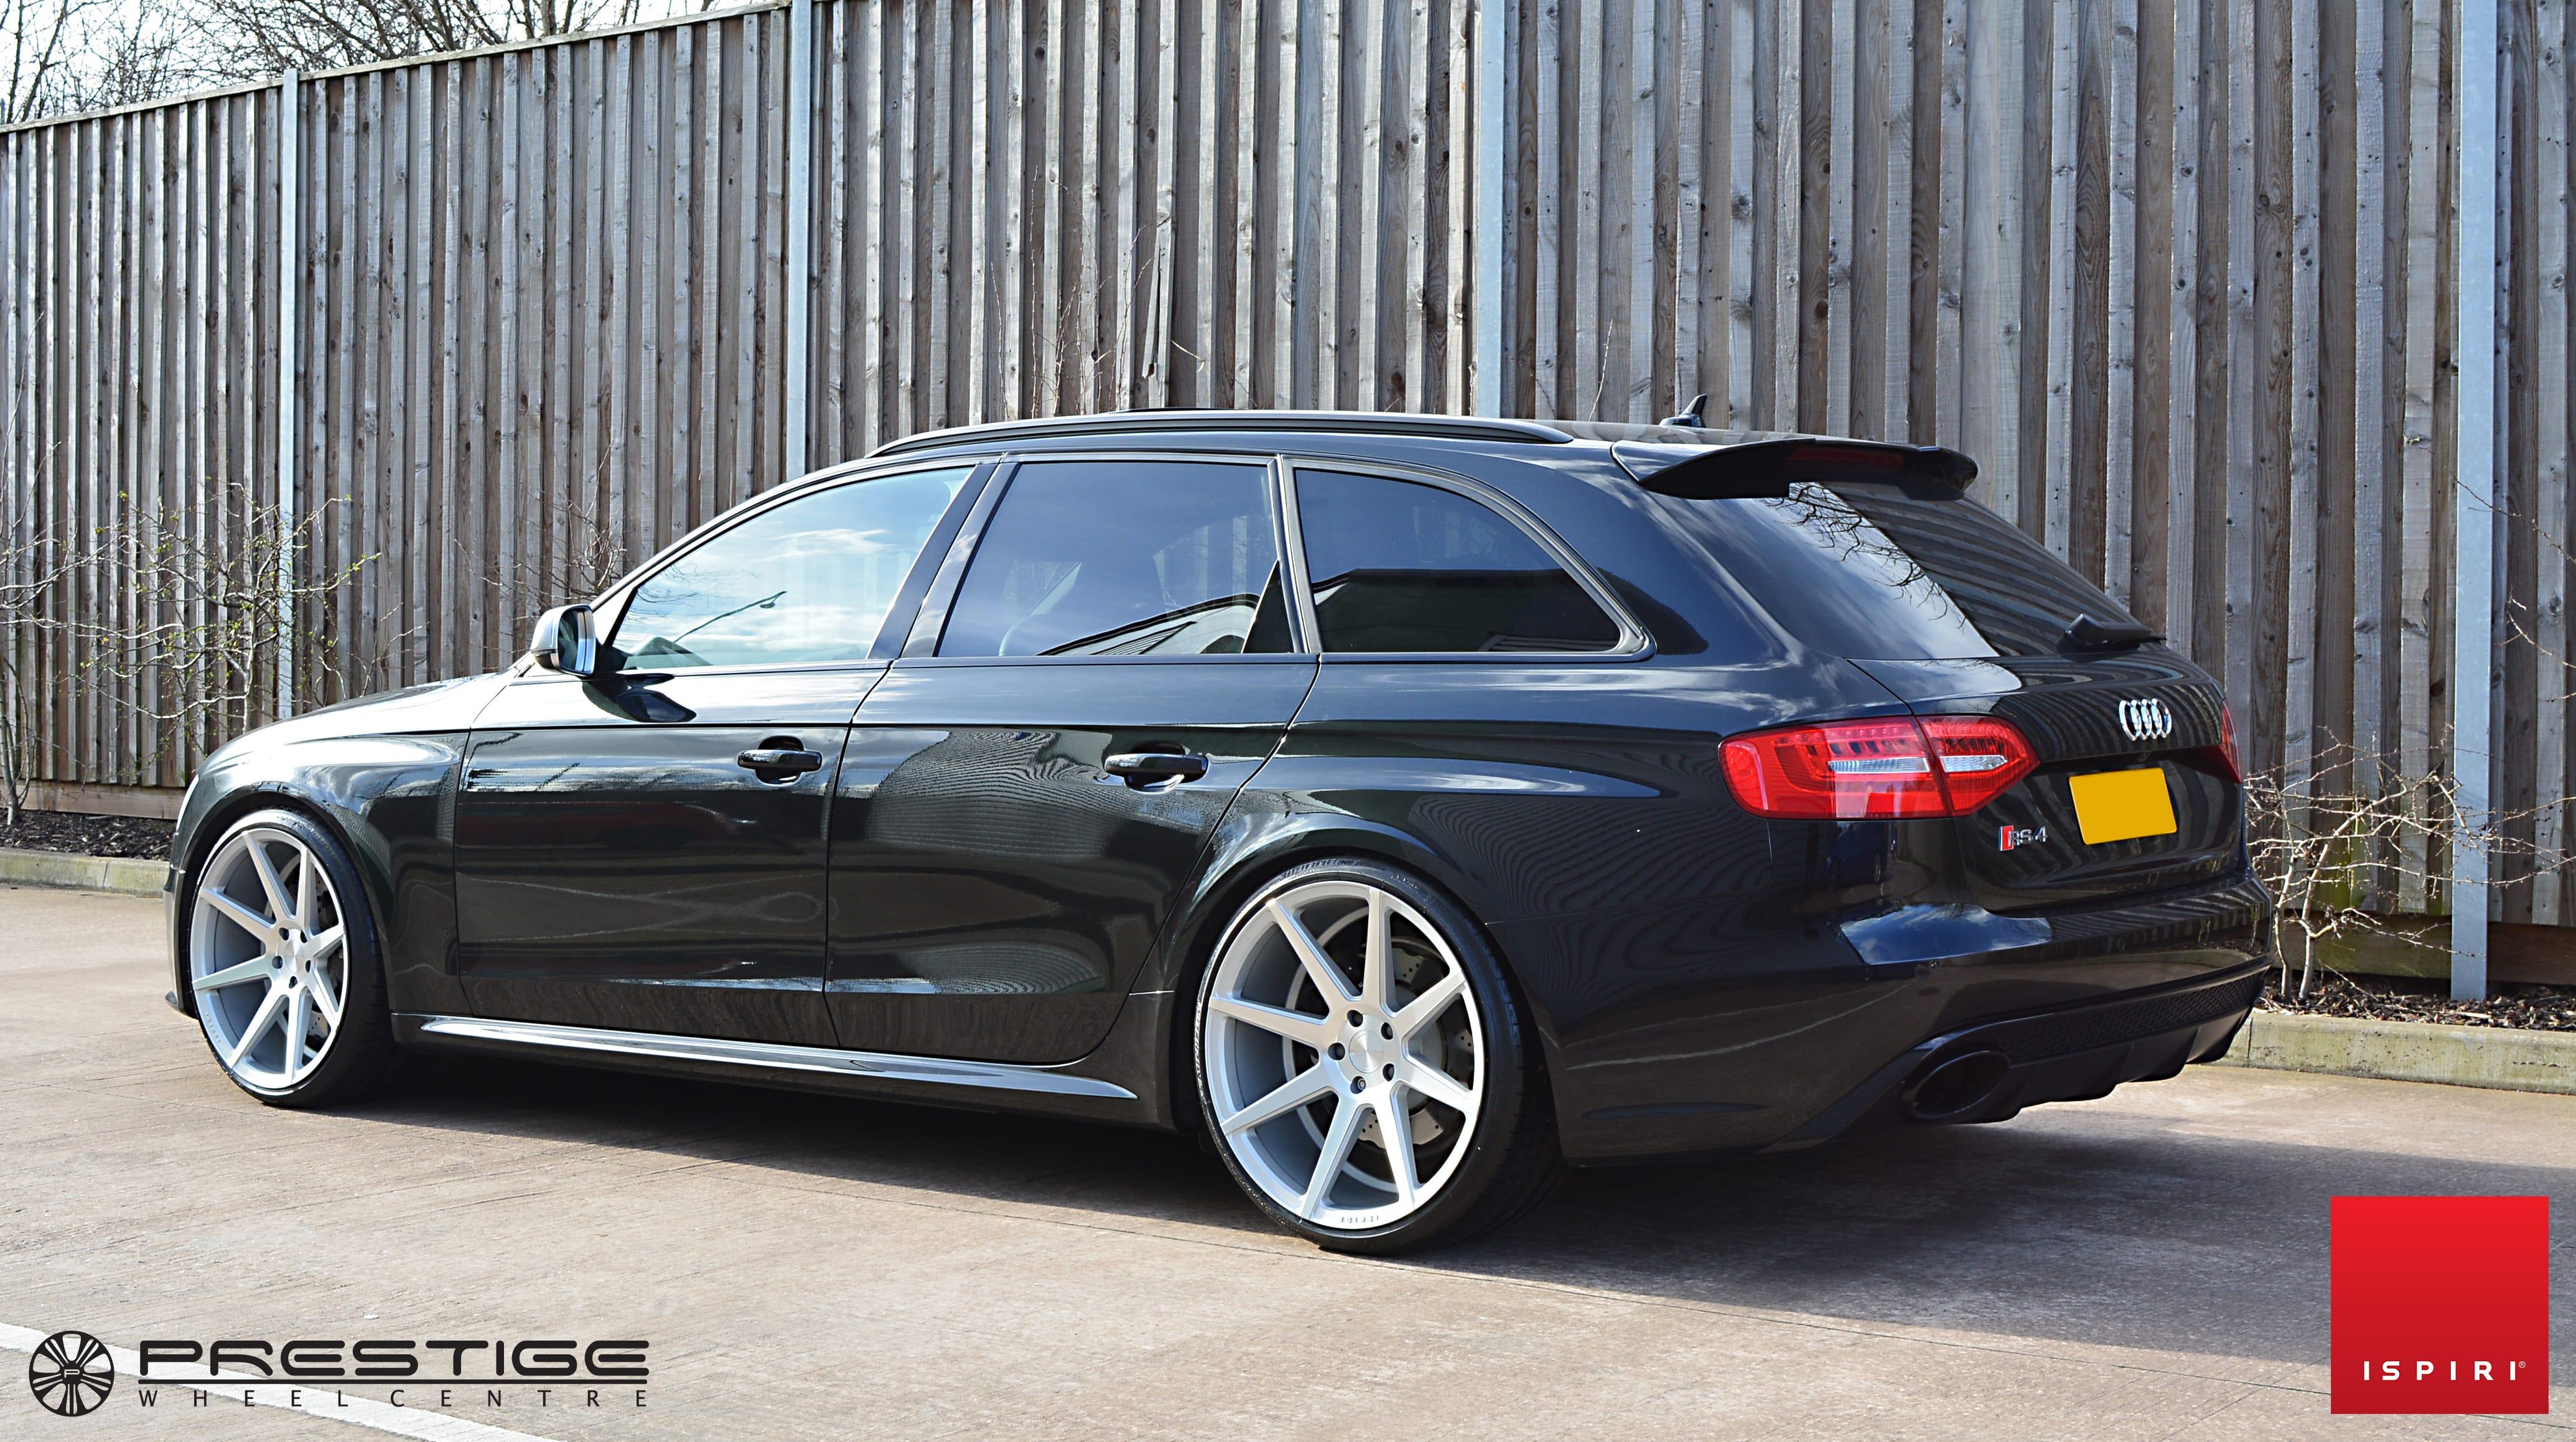 Ispiri Isr8 In Satin Silver Machined Audi Rs4 B8